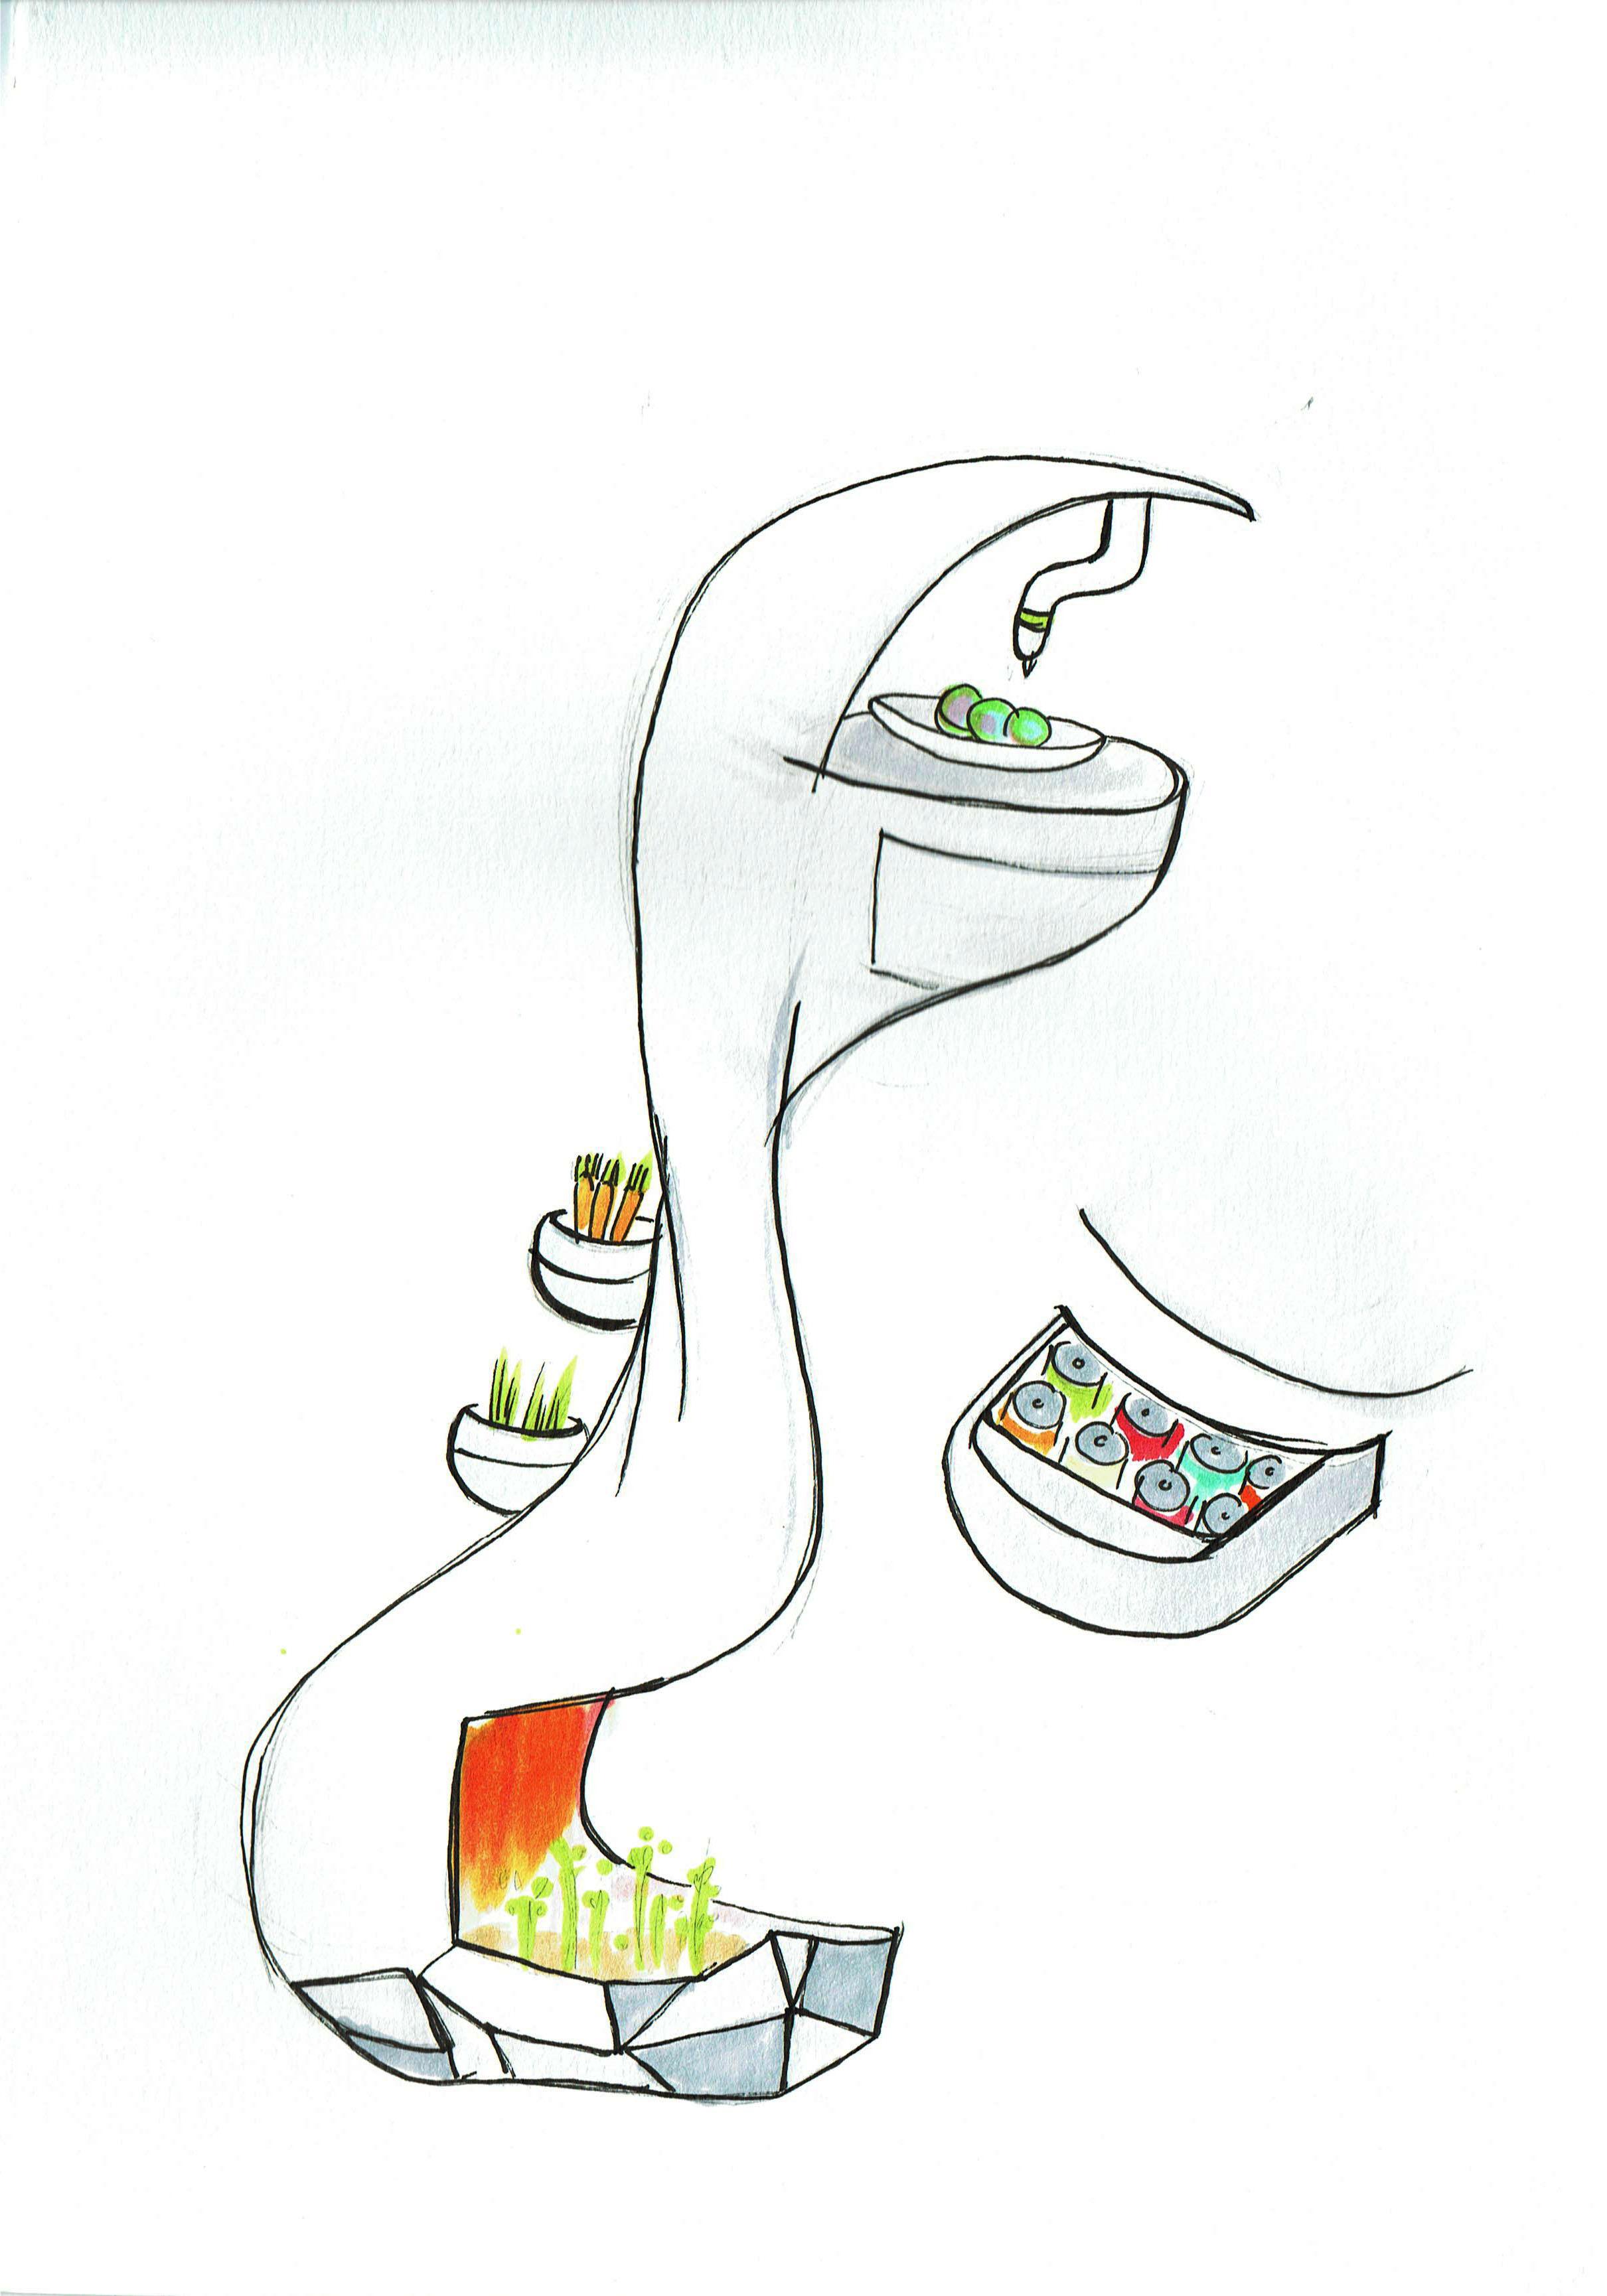 future fridge 1.jpg